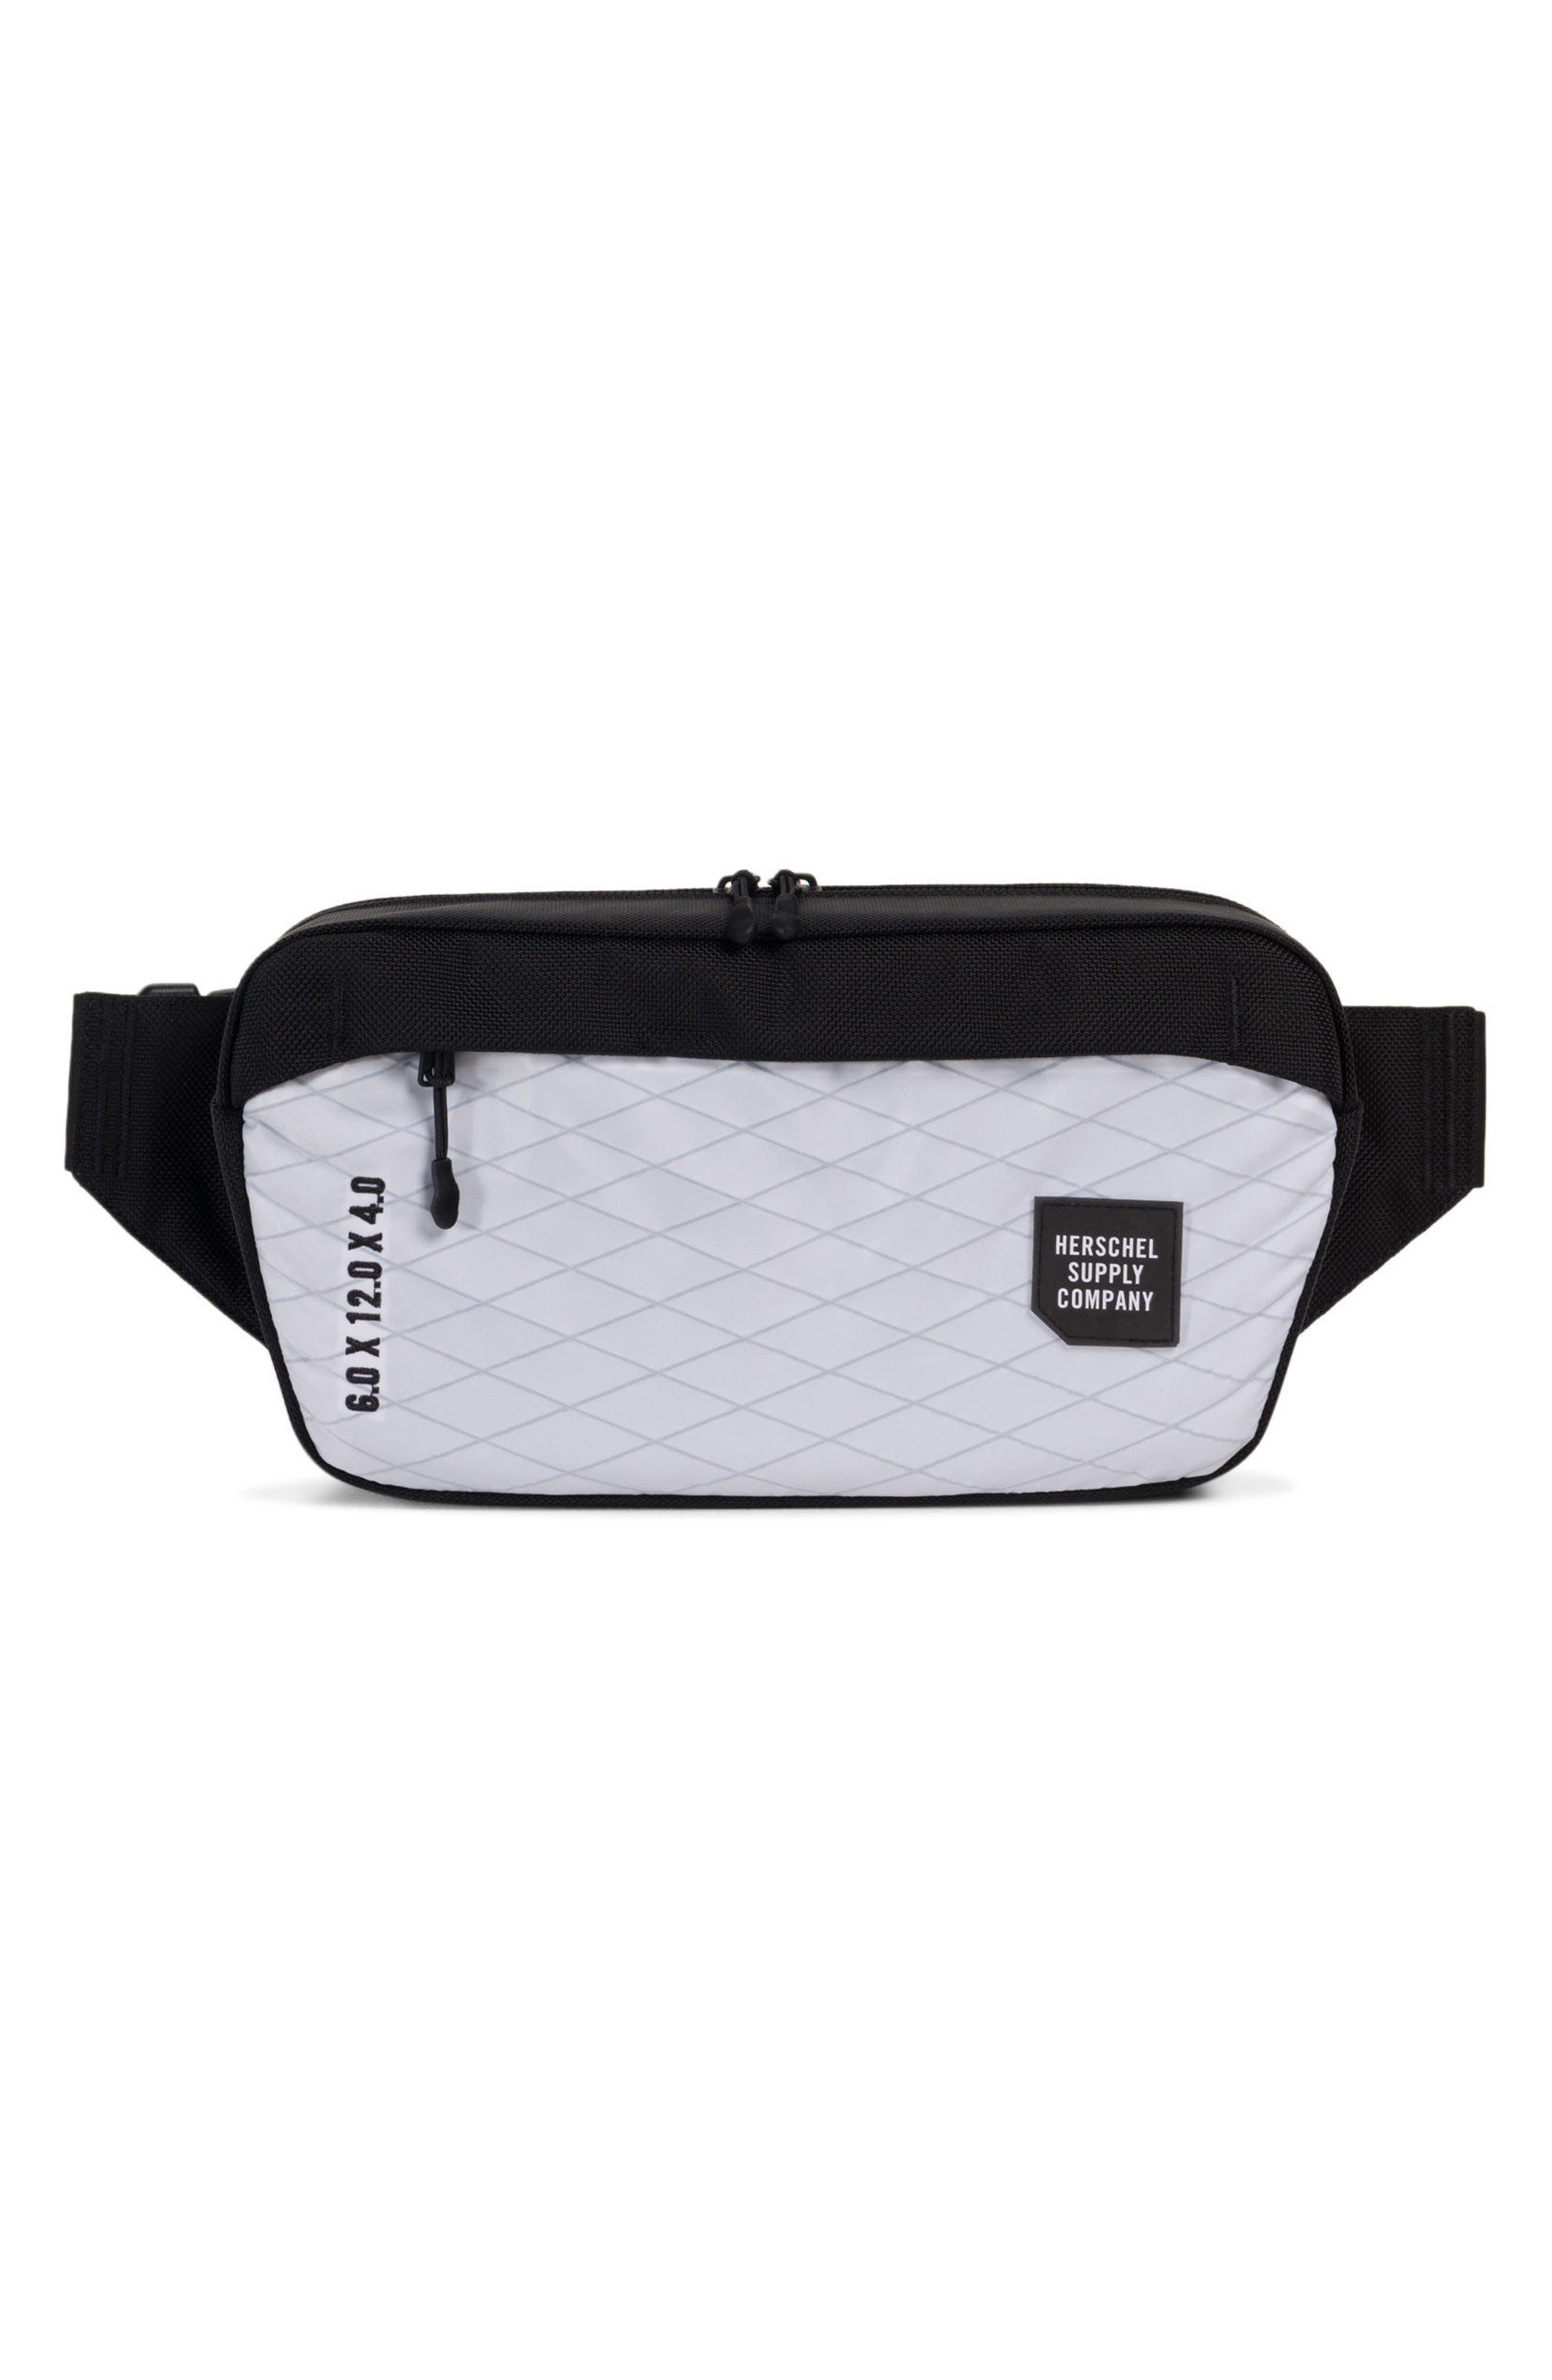 Trail Sailcloth Mammoth Belt Bag,                             Main thumbnail 1, color,                             White/ Black